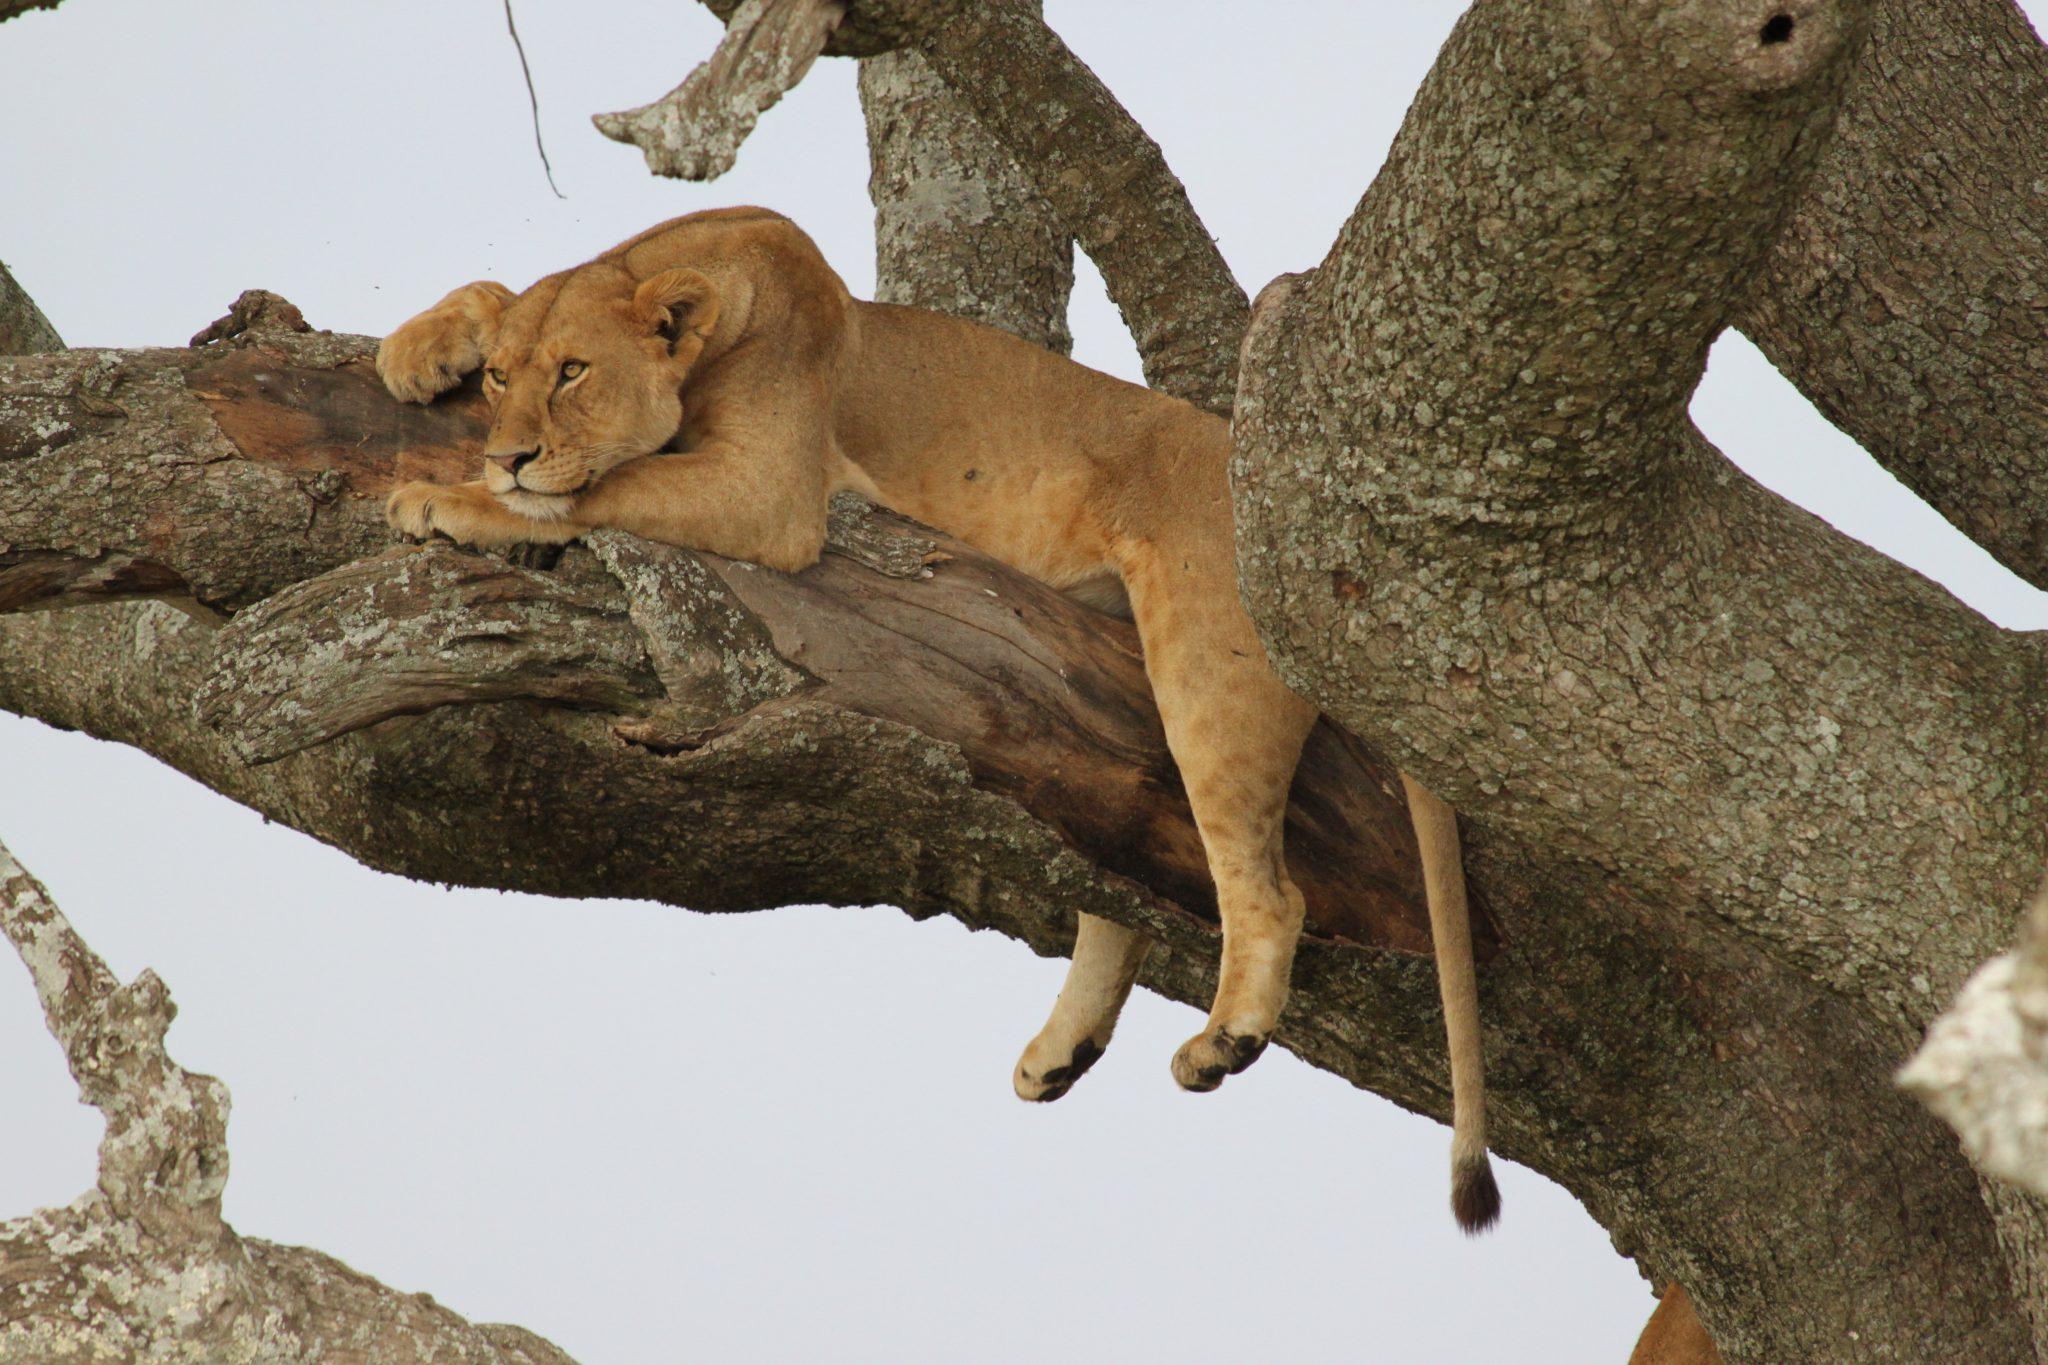 tanzania, africa, serengeti, safari, lion, african safari